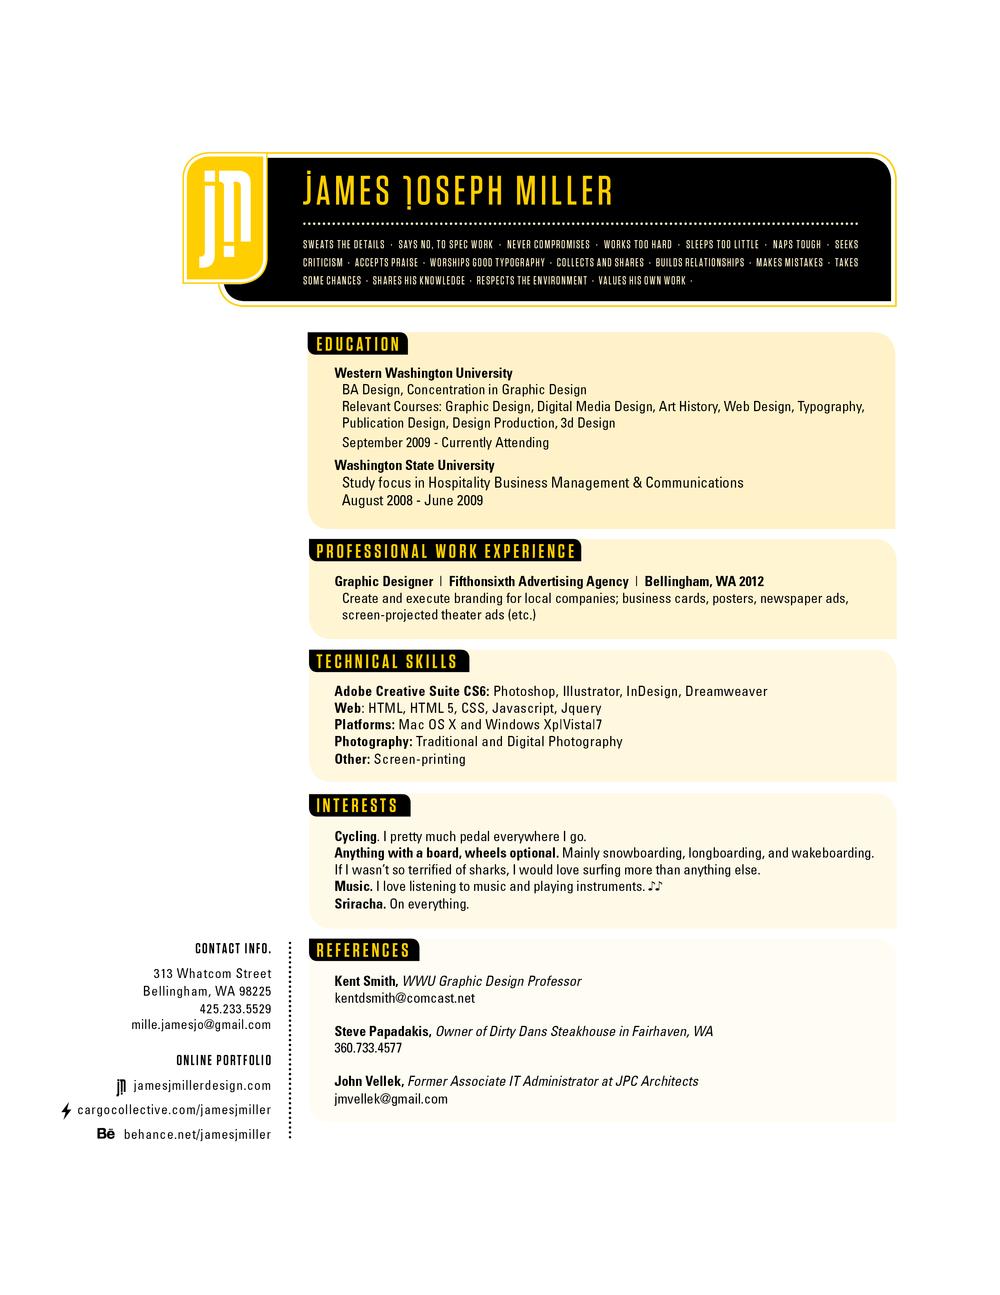 jamesjmiller_resume.png